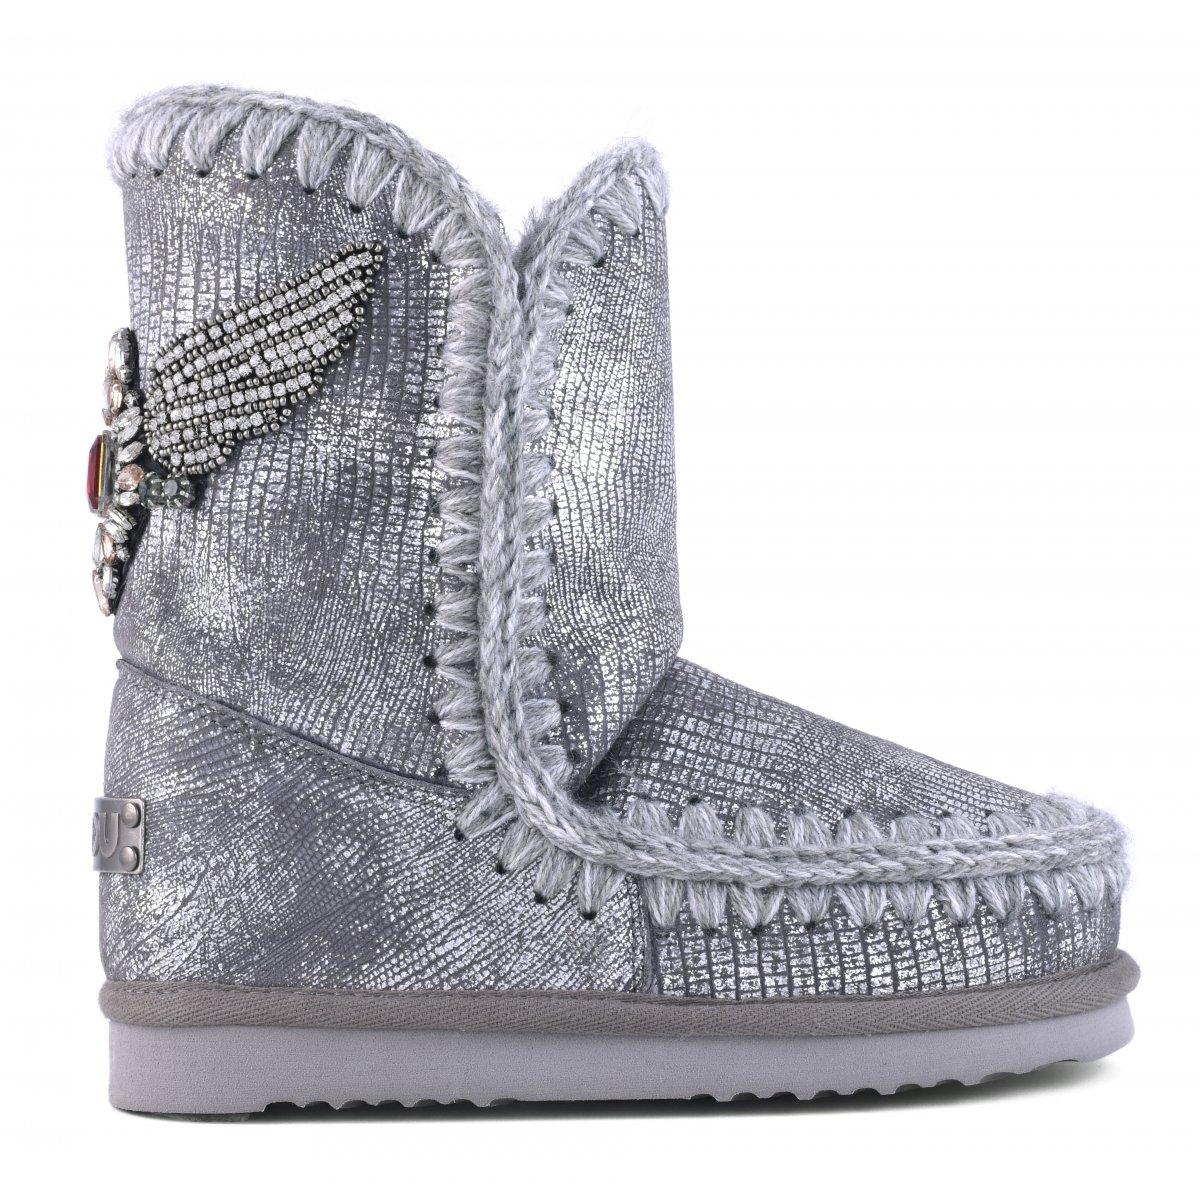 eskimo 24 eagle patch - ankle boots mou